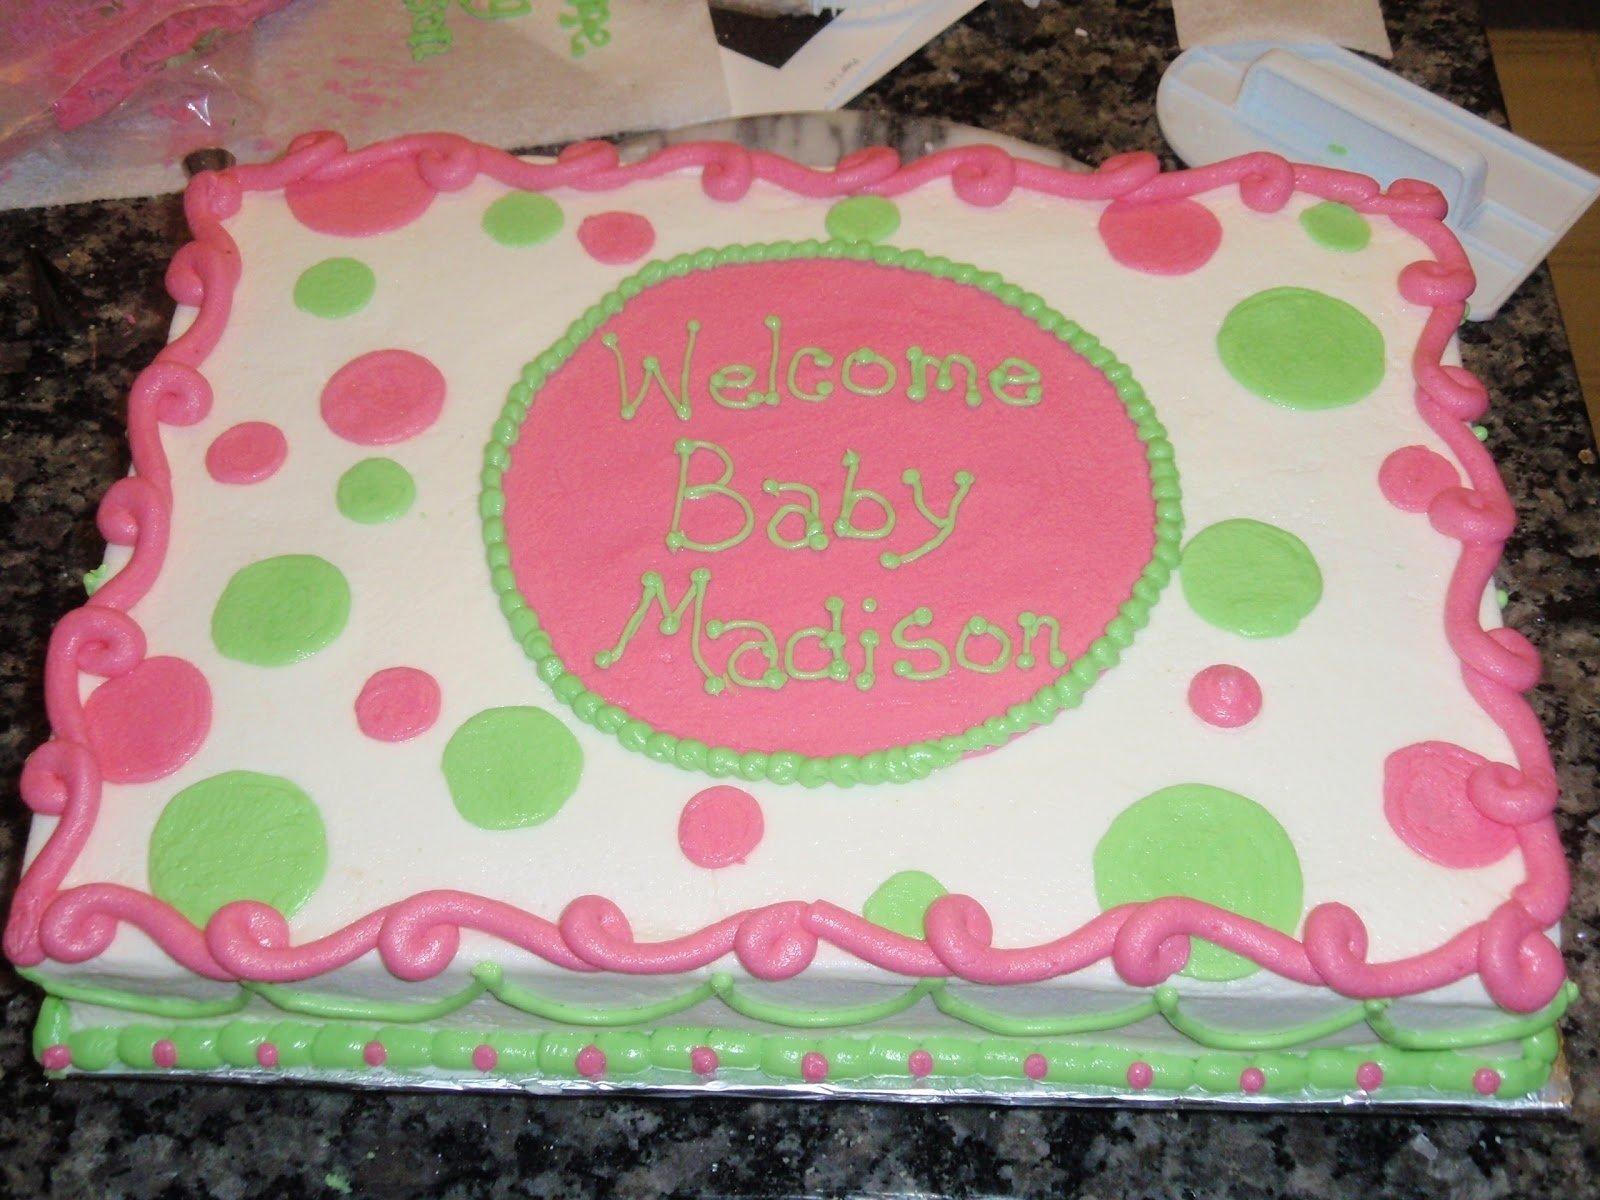 10 Nice Baby Shower Sheet Cake Ideas image result for baby shower sheet cake ideas baby shower themes 2021